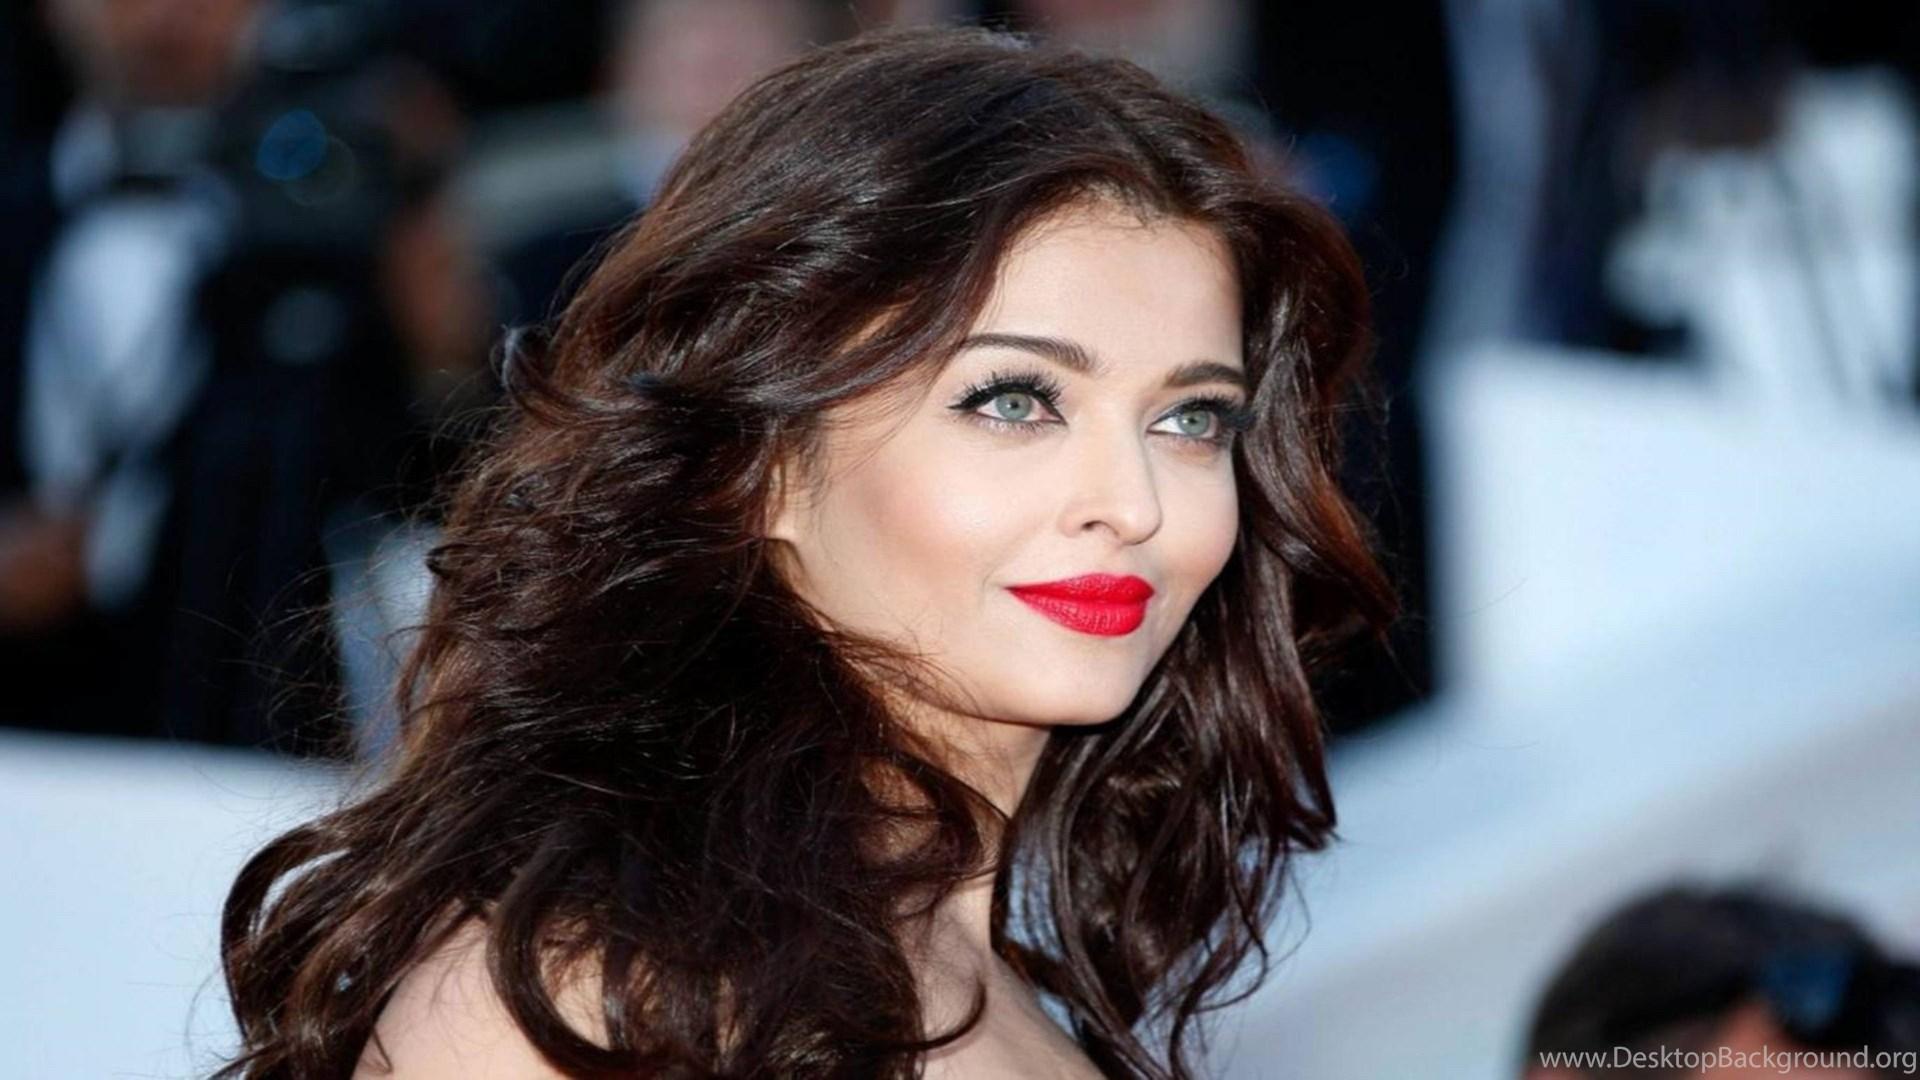 Beautiful Hot Indian Actress 4k Hd Wallpapers 7 Desktop Background